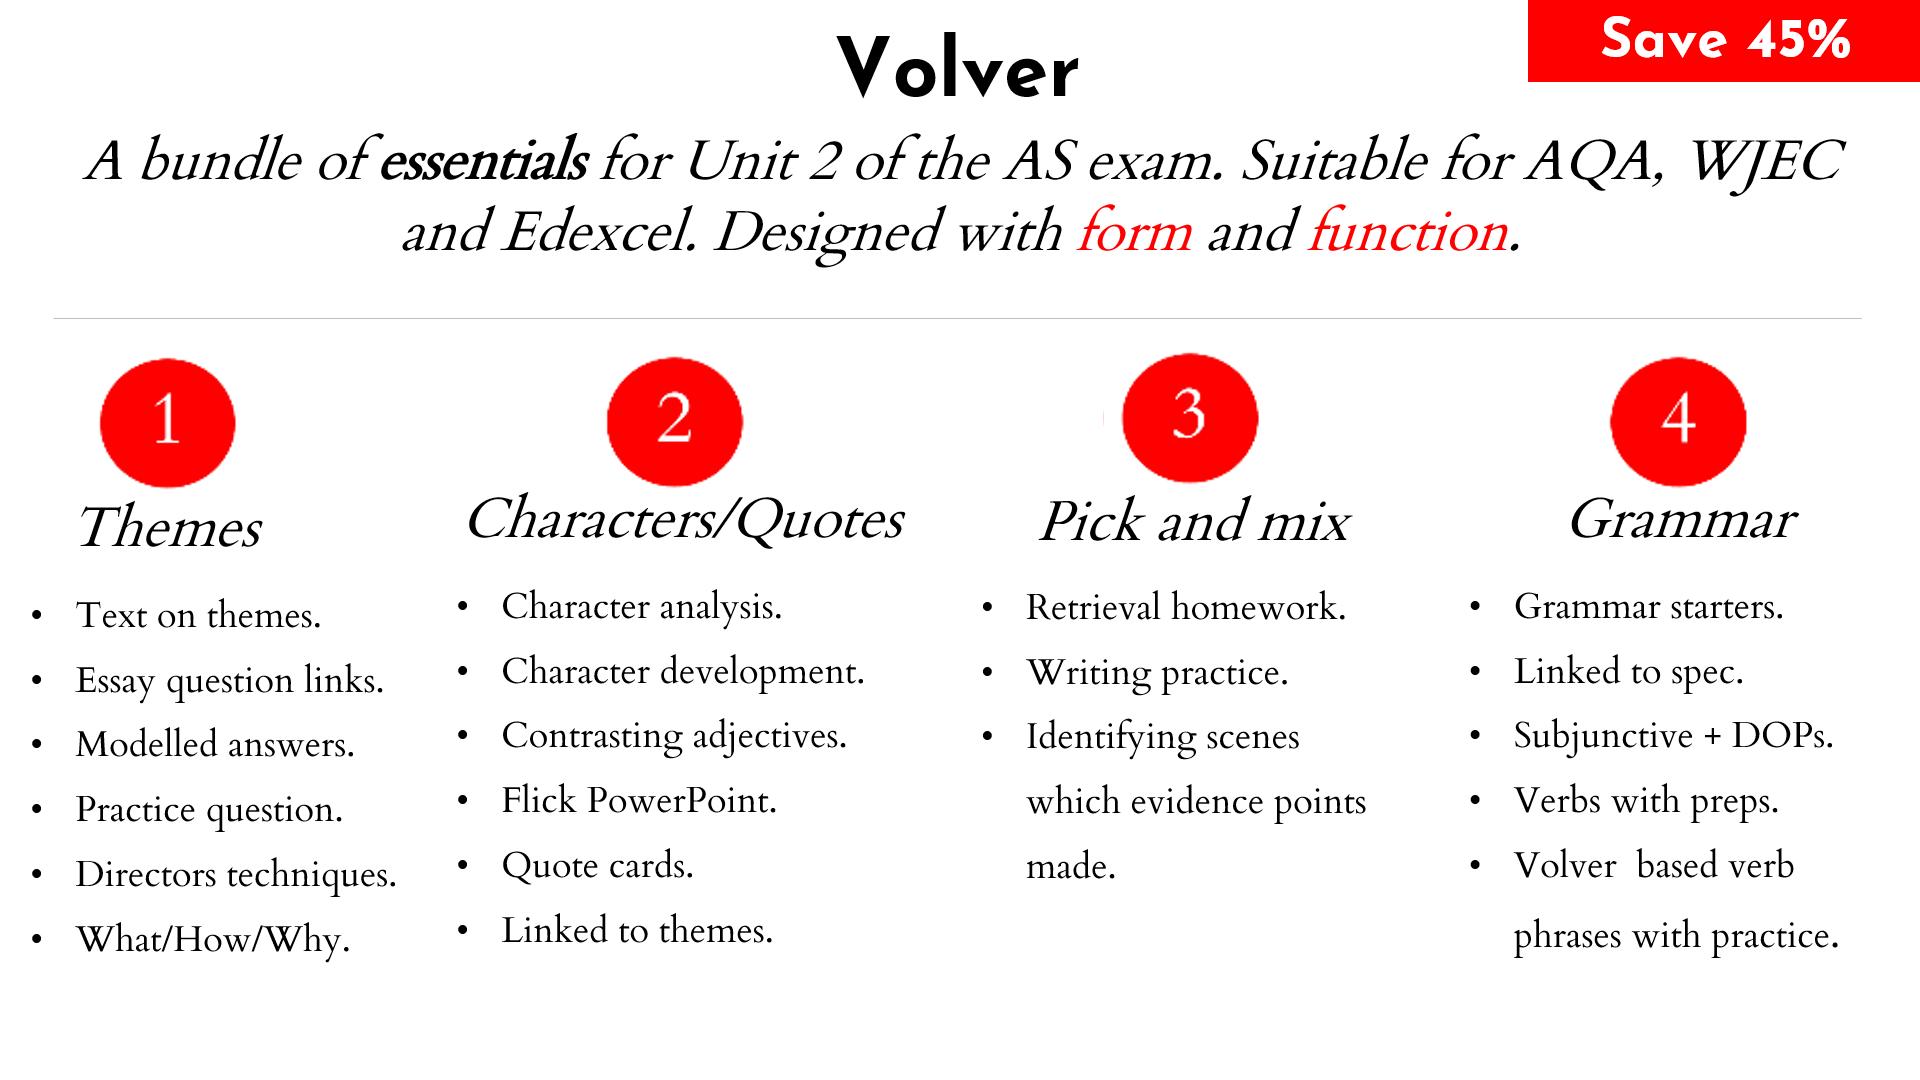 Volver : Essentials